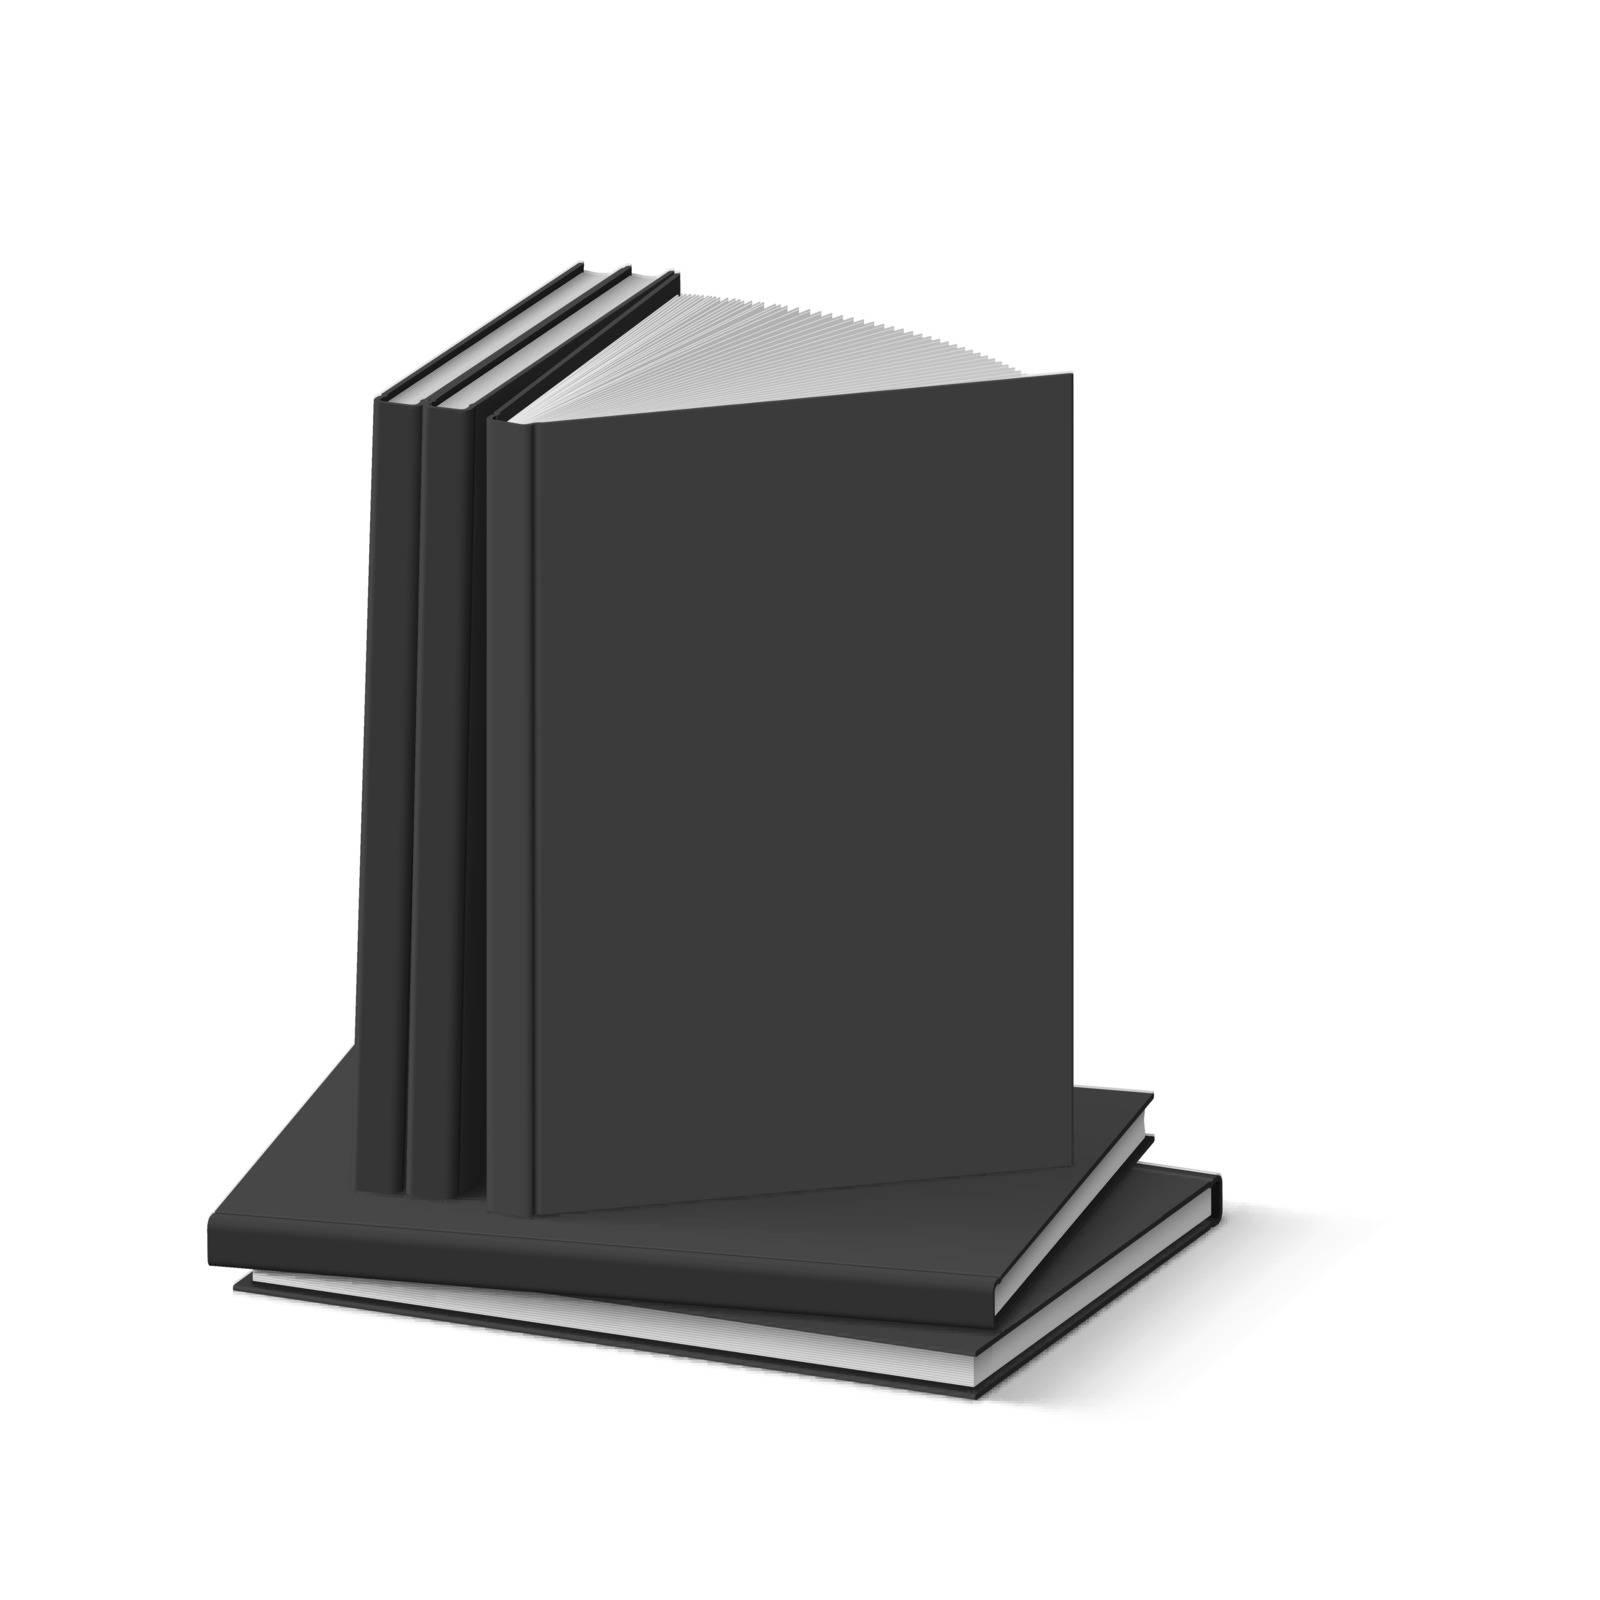 Stack of Blank Black Books on White Background